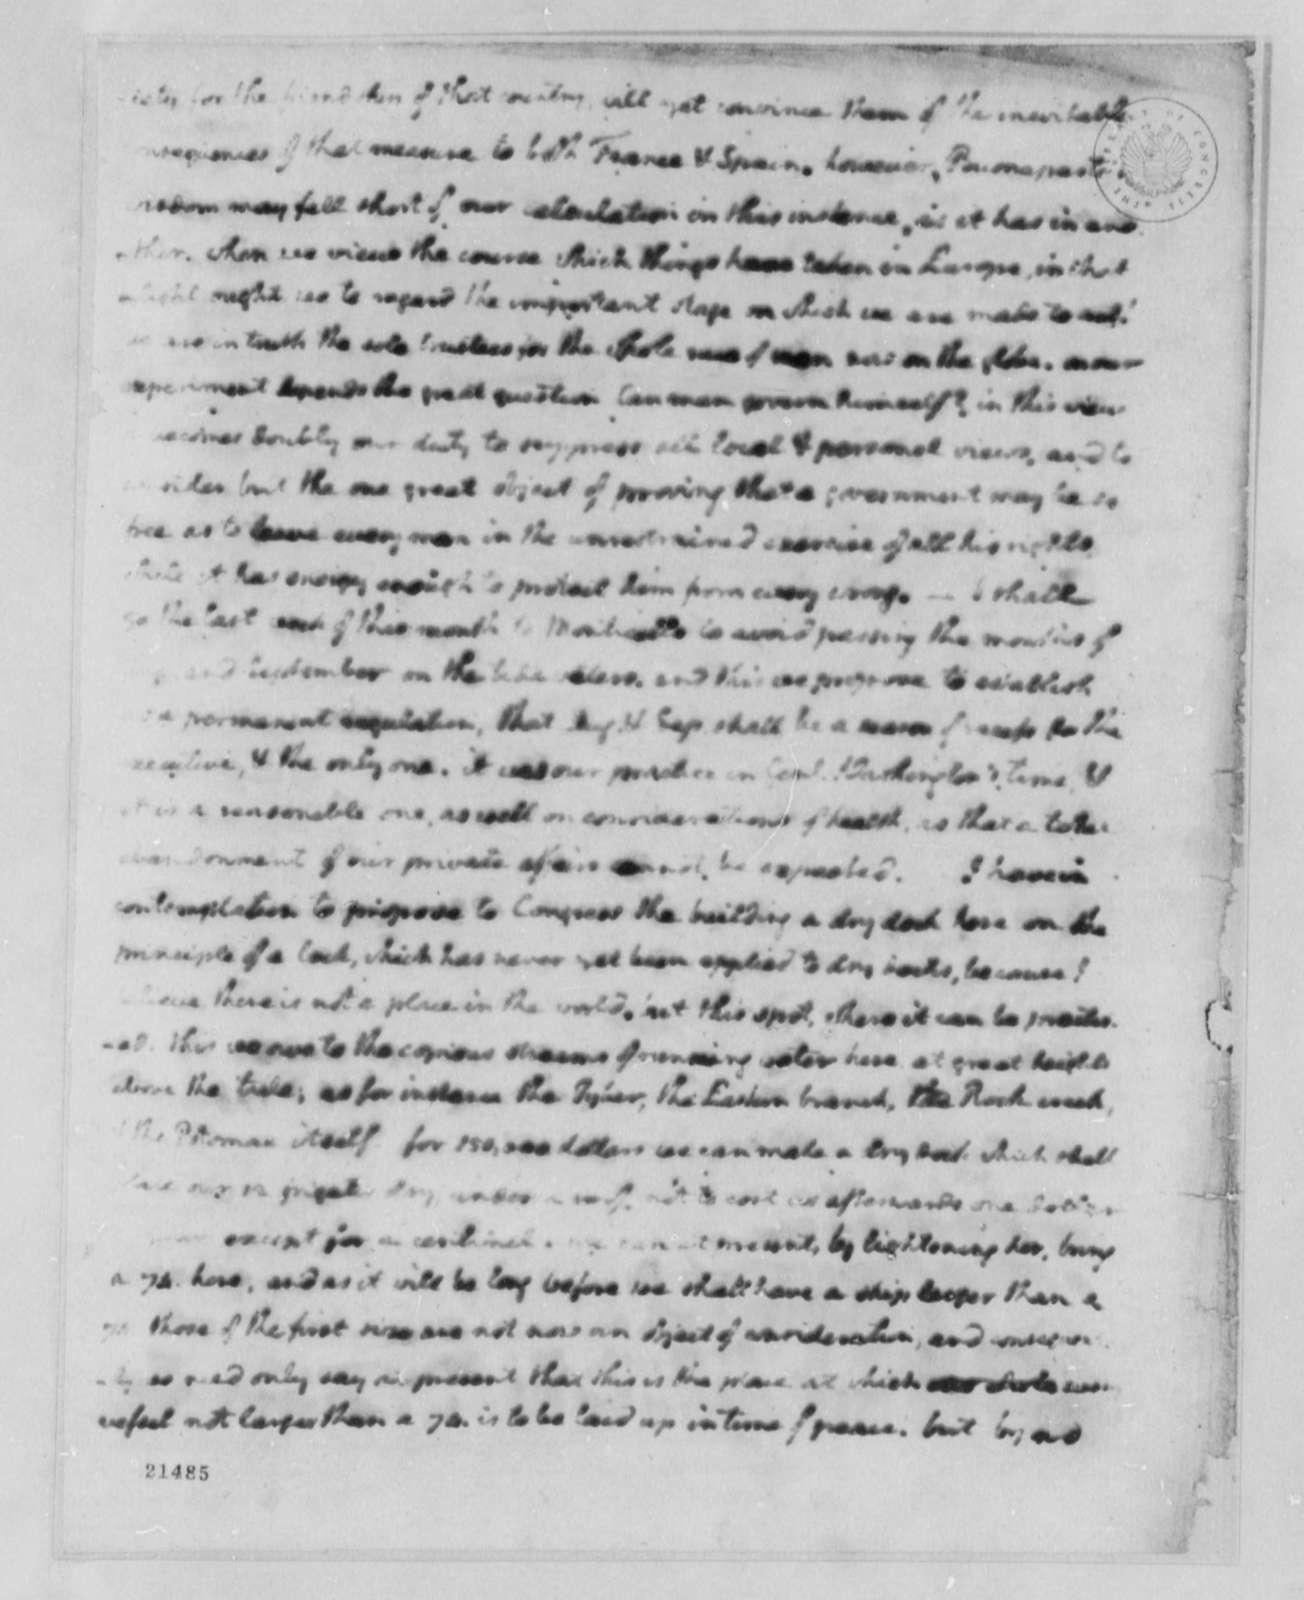 Thomas Jefferson to Nathaniel Macon, July 17, 1802